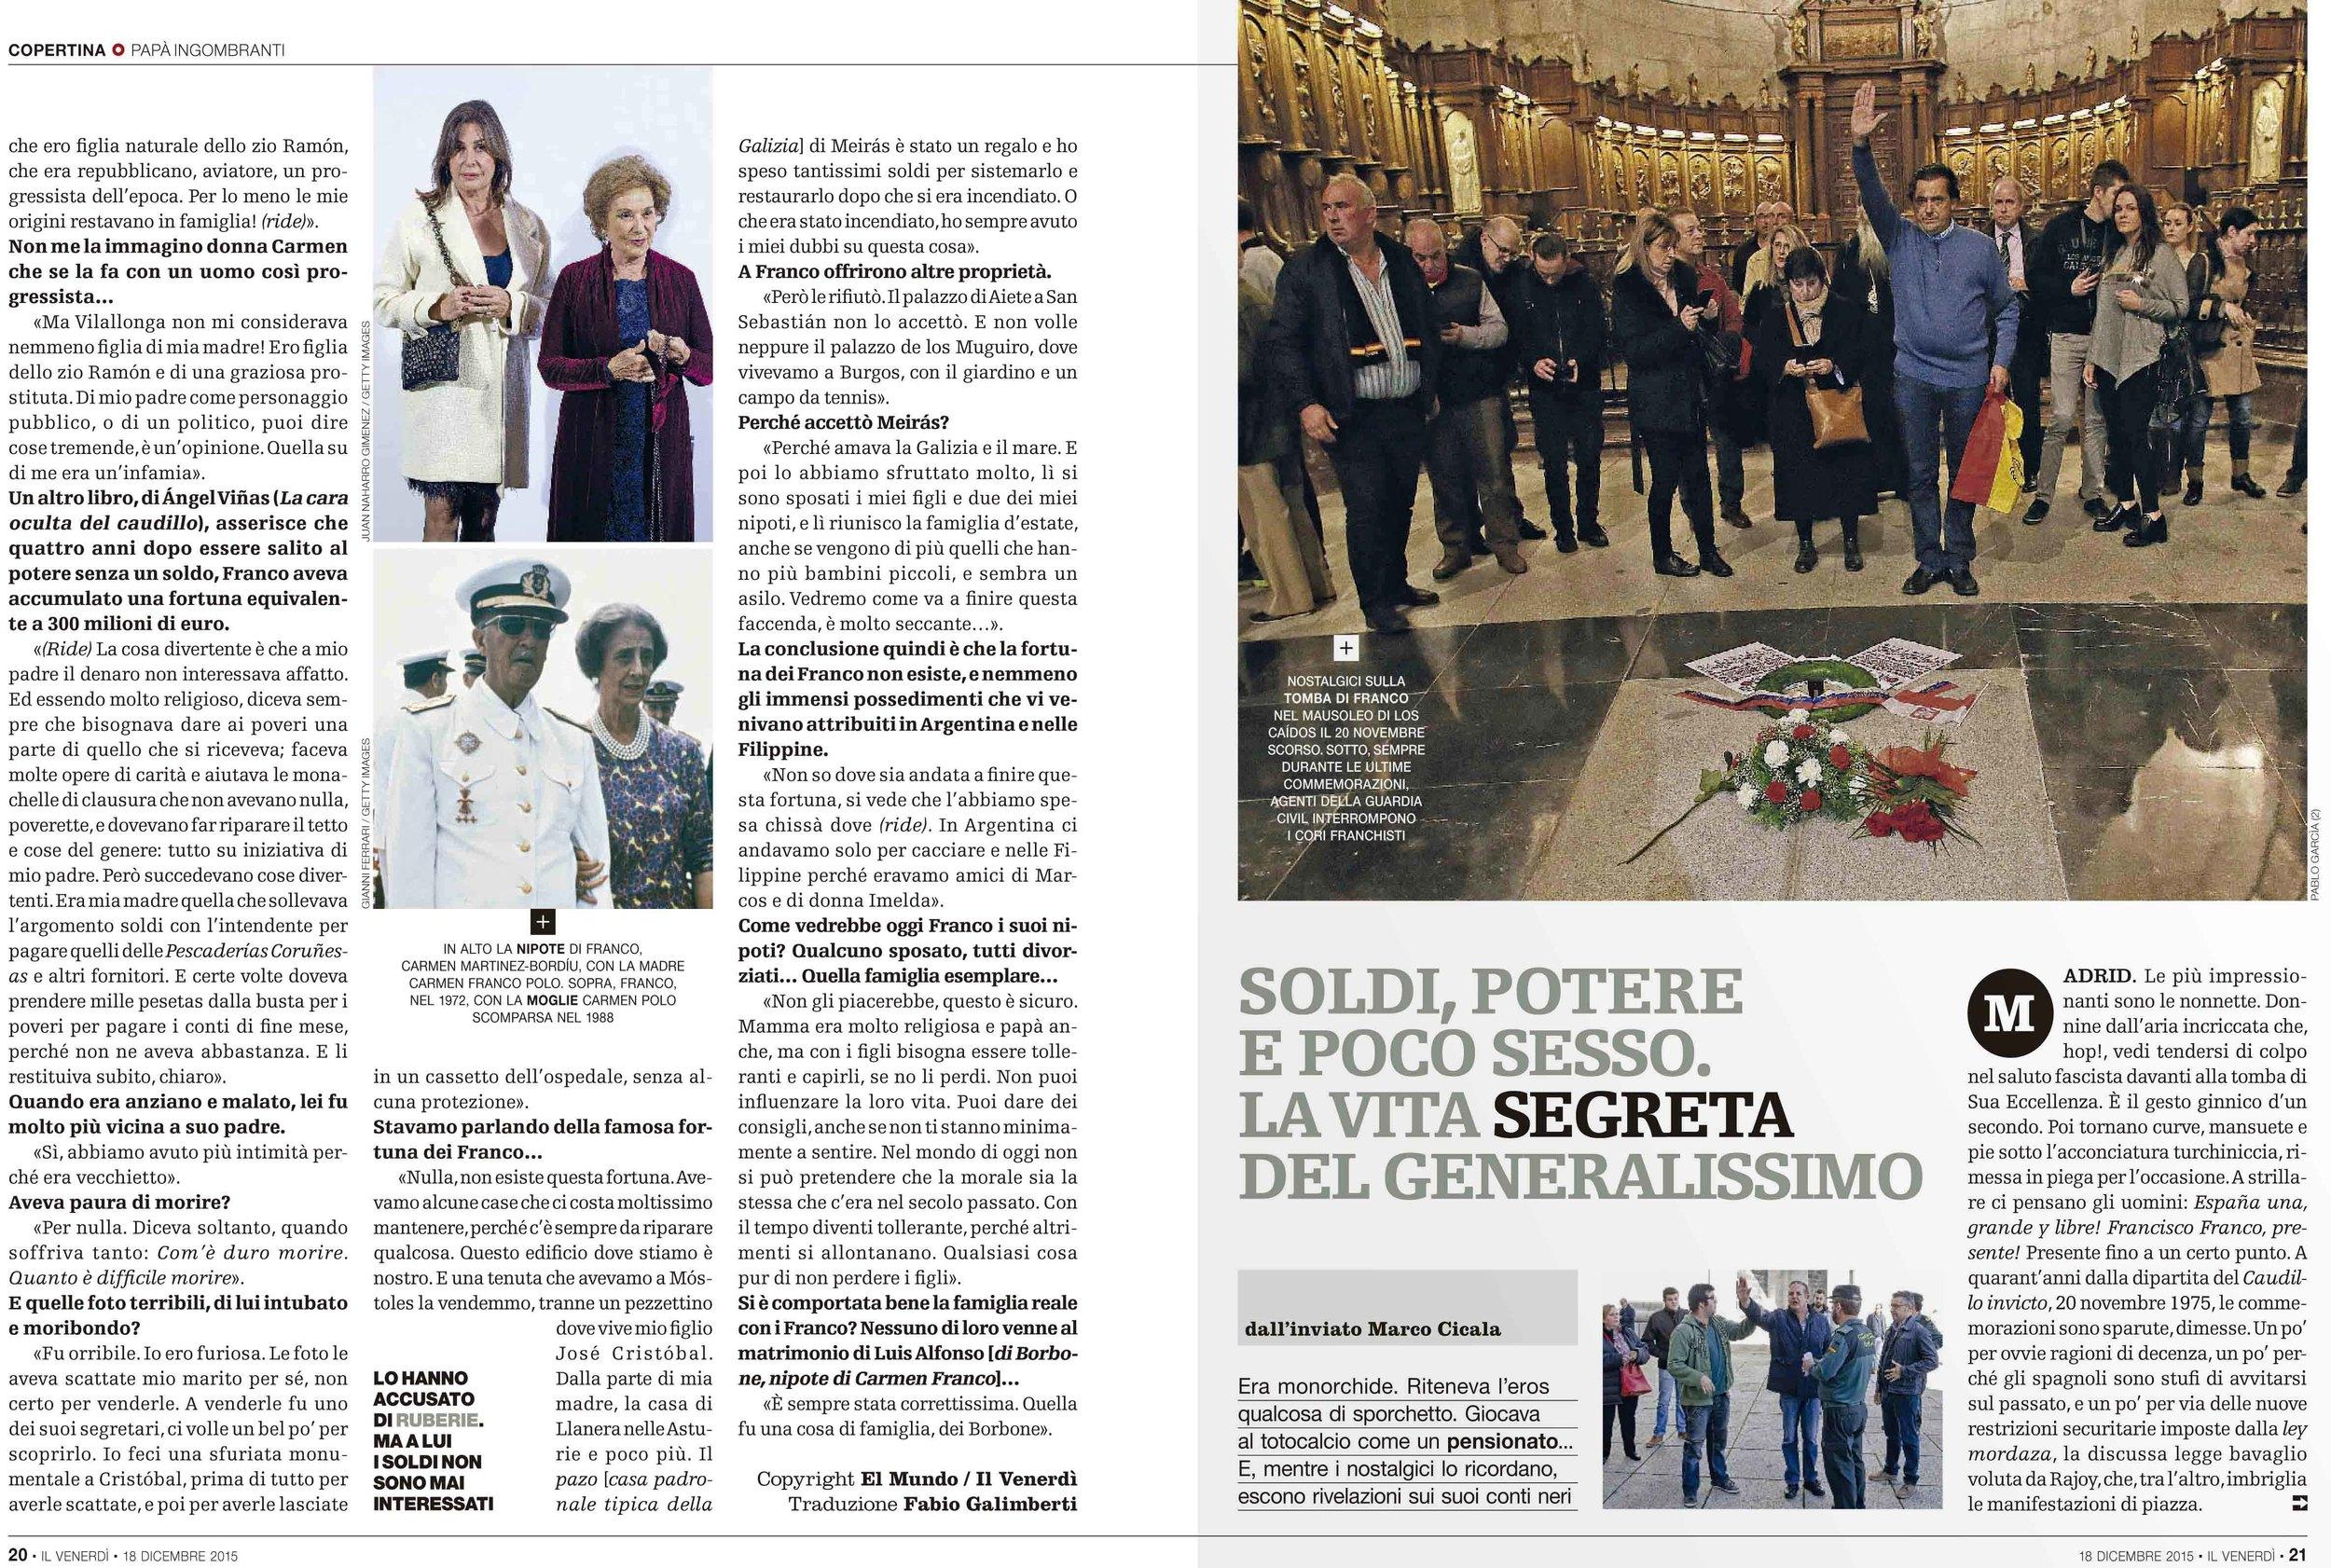 pagina1 copy.jpg